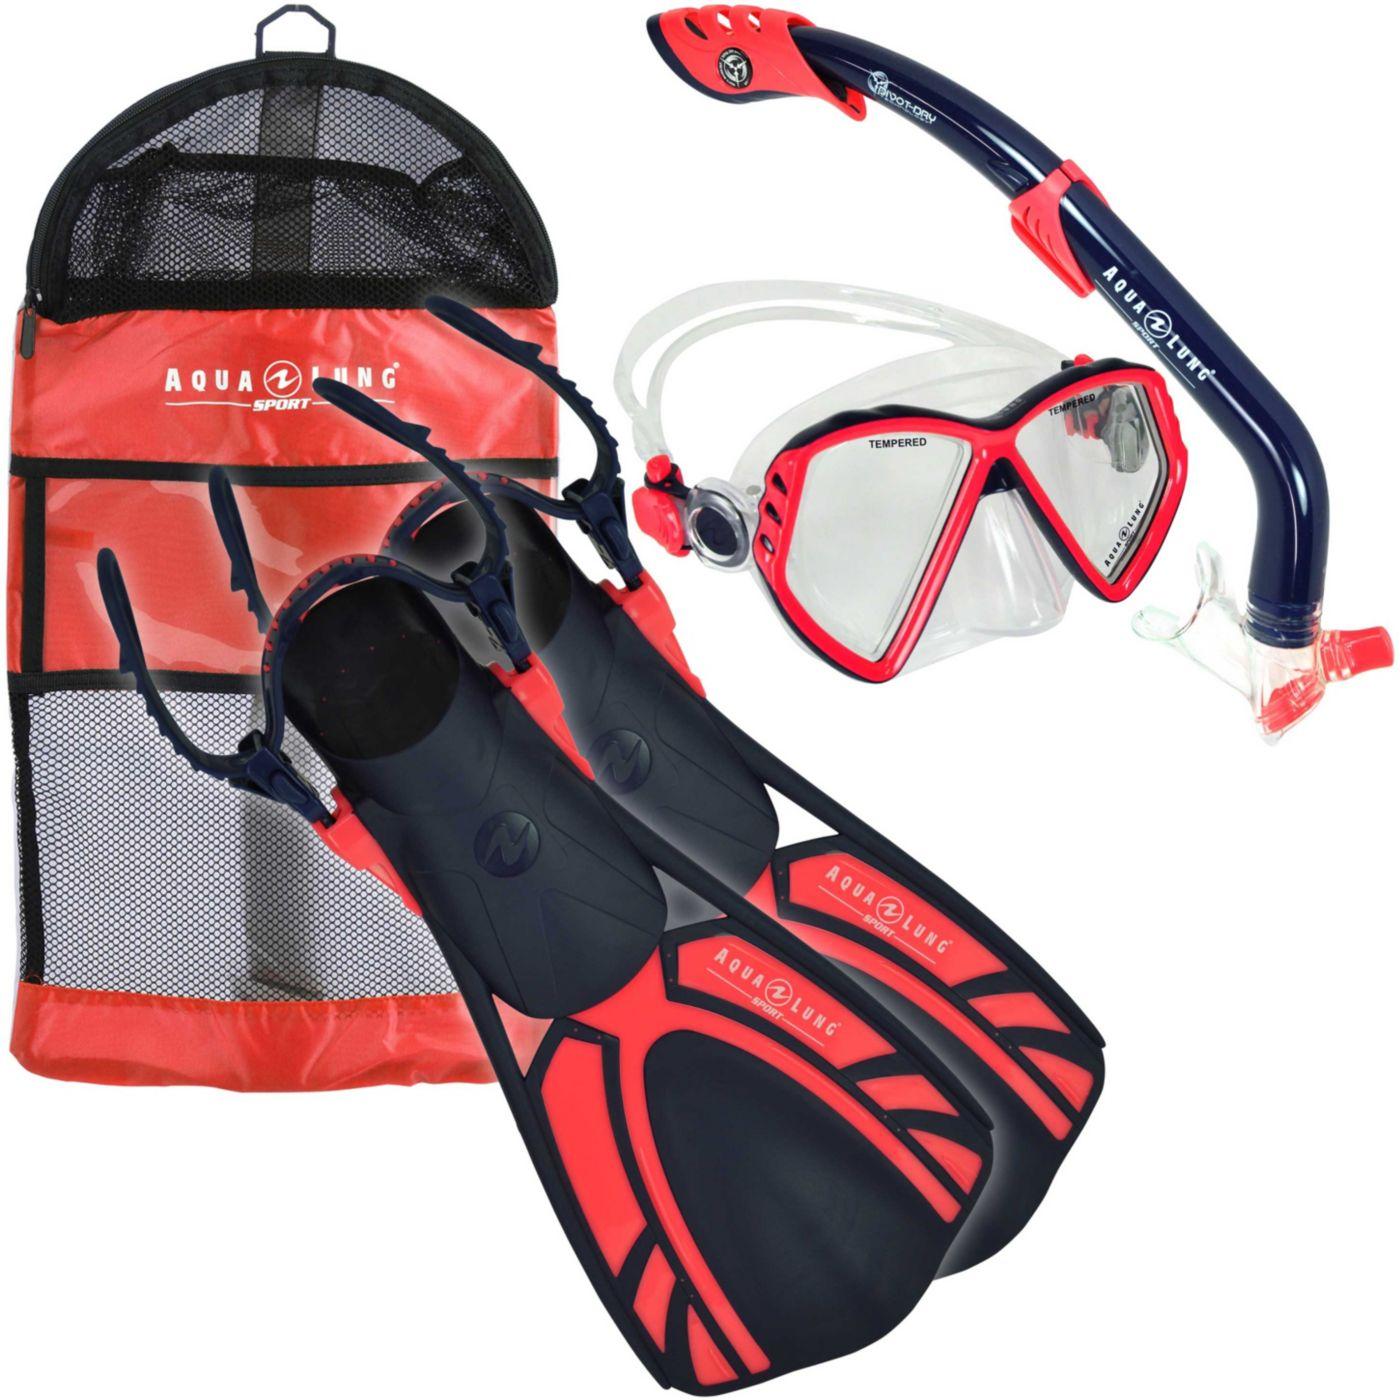 Aqua Lung Sport Jr. 4-Piece Snorkeling Set